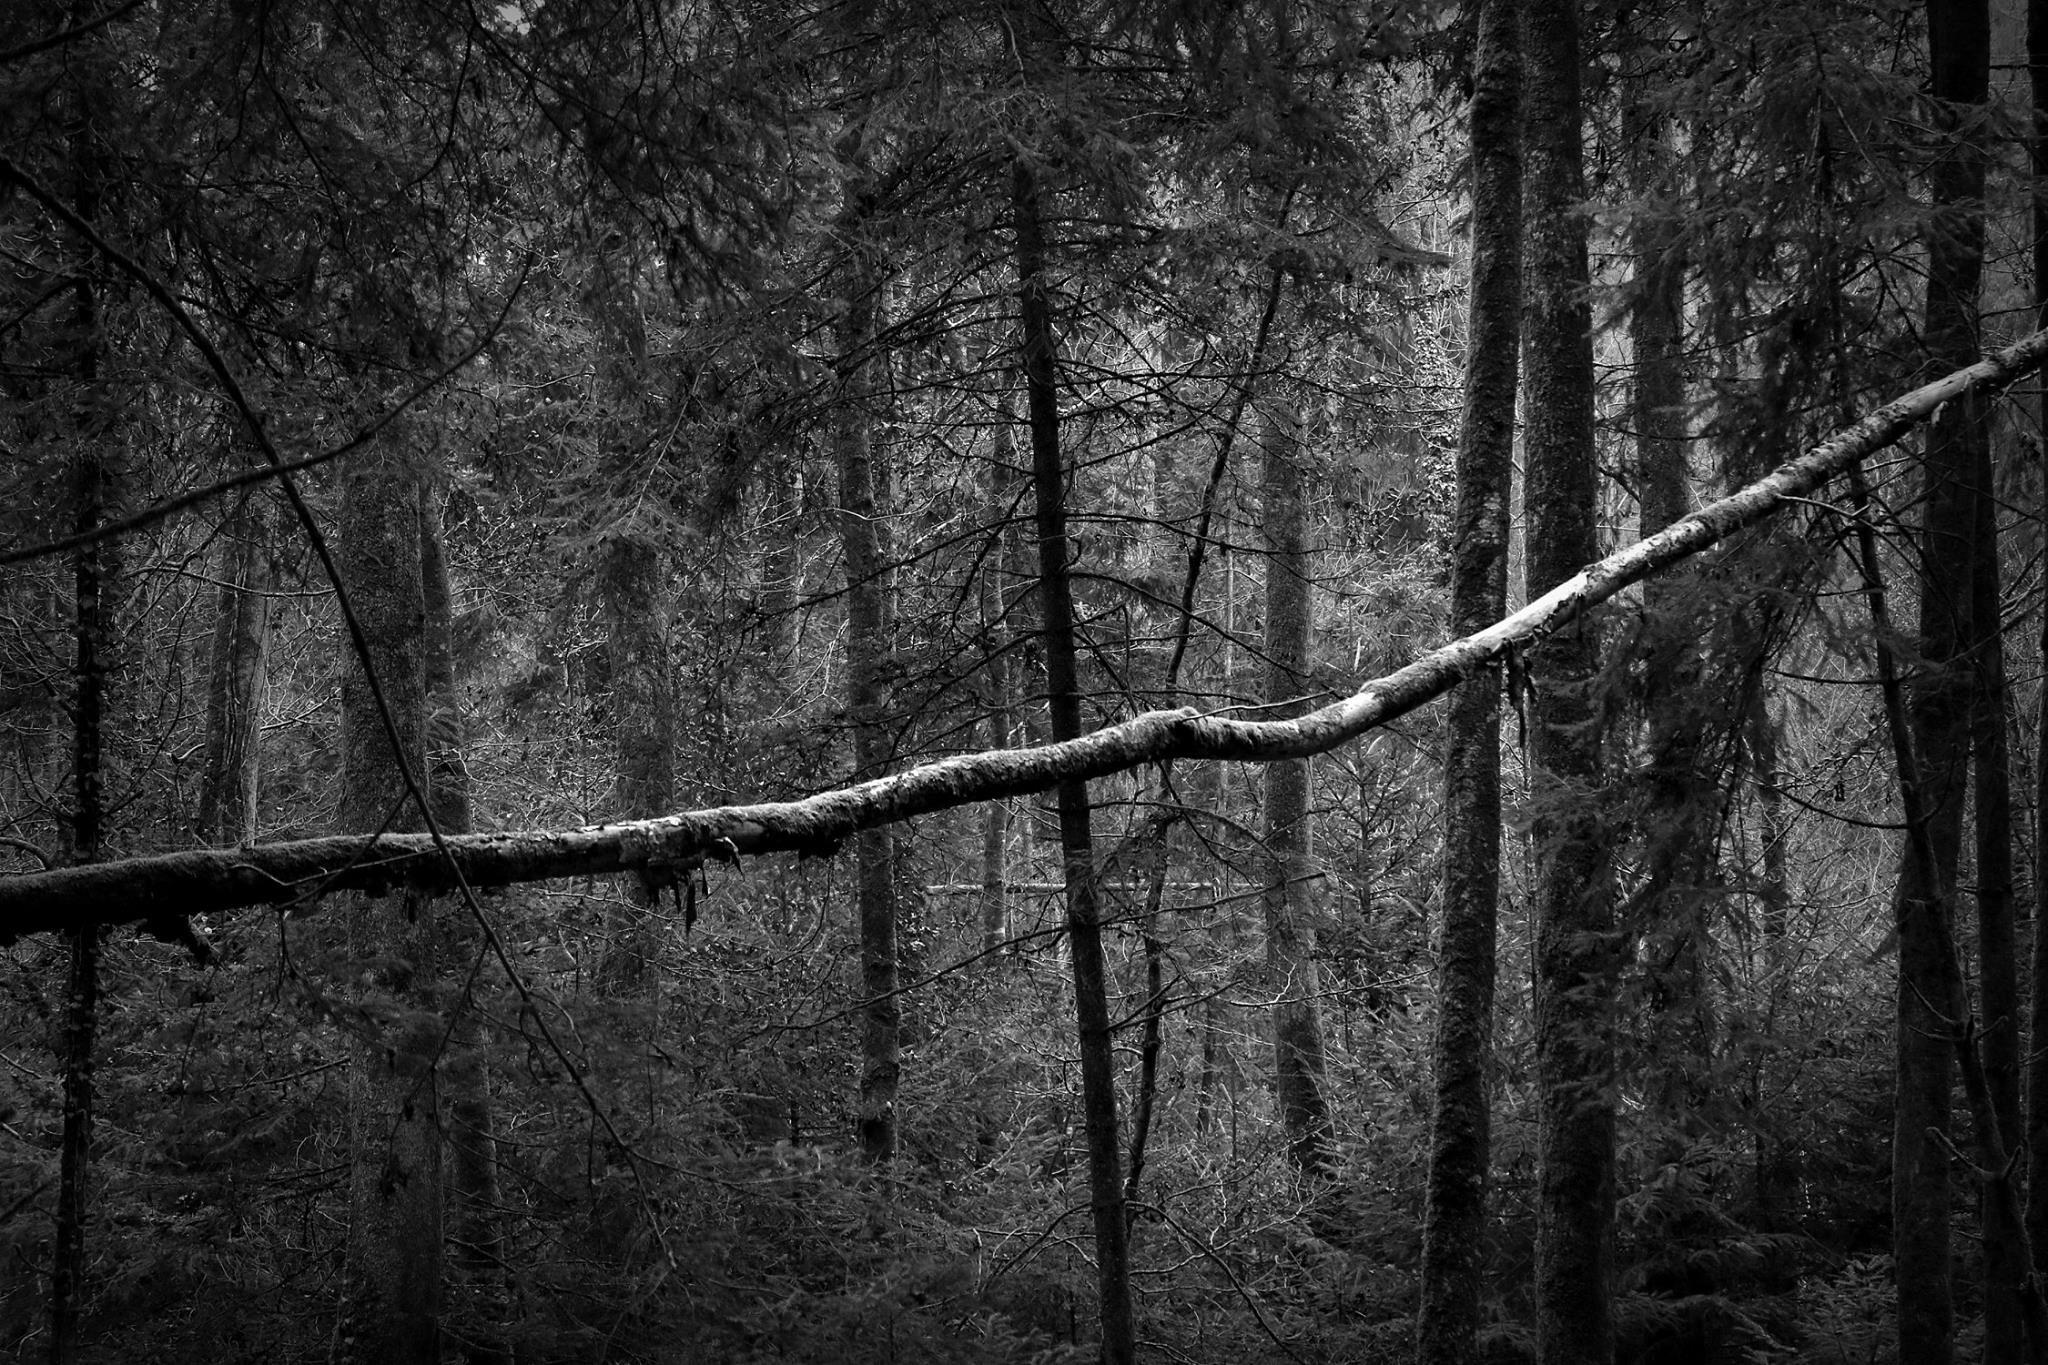 Untitled by Michel Villard